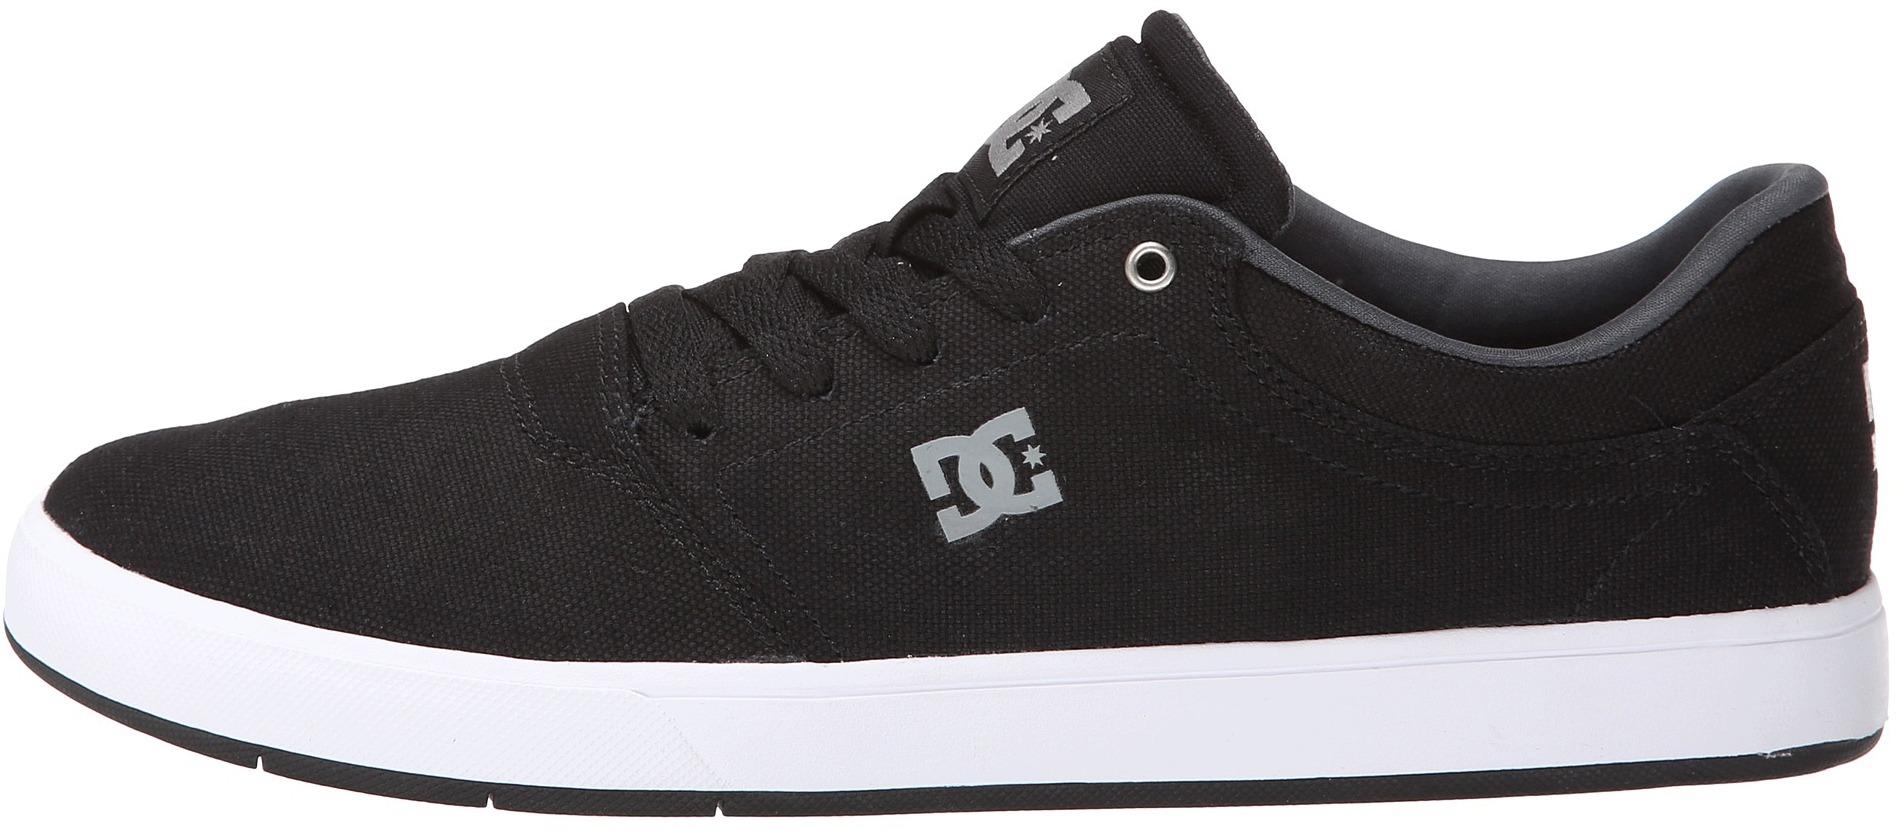 DC Crisis TX Vegan Skateboard Shoe